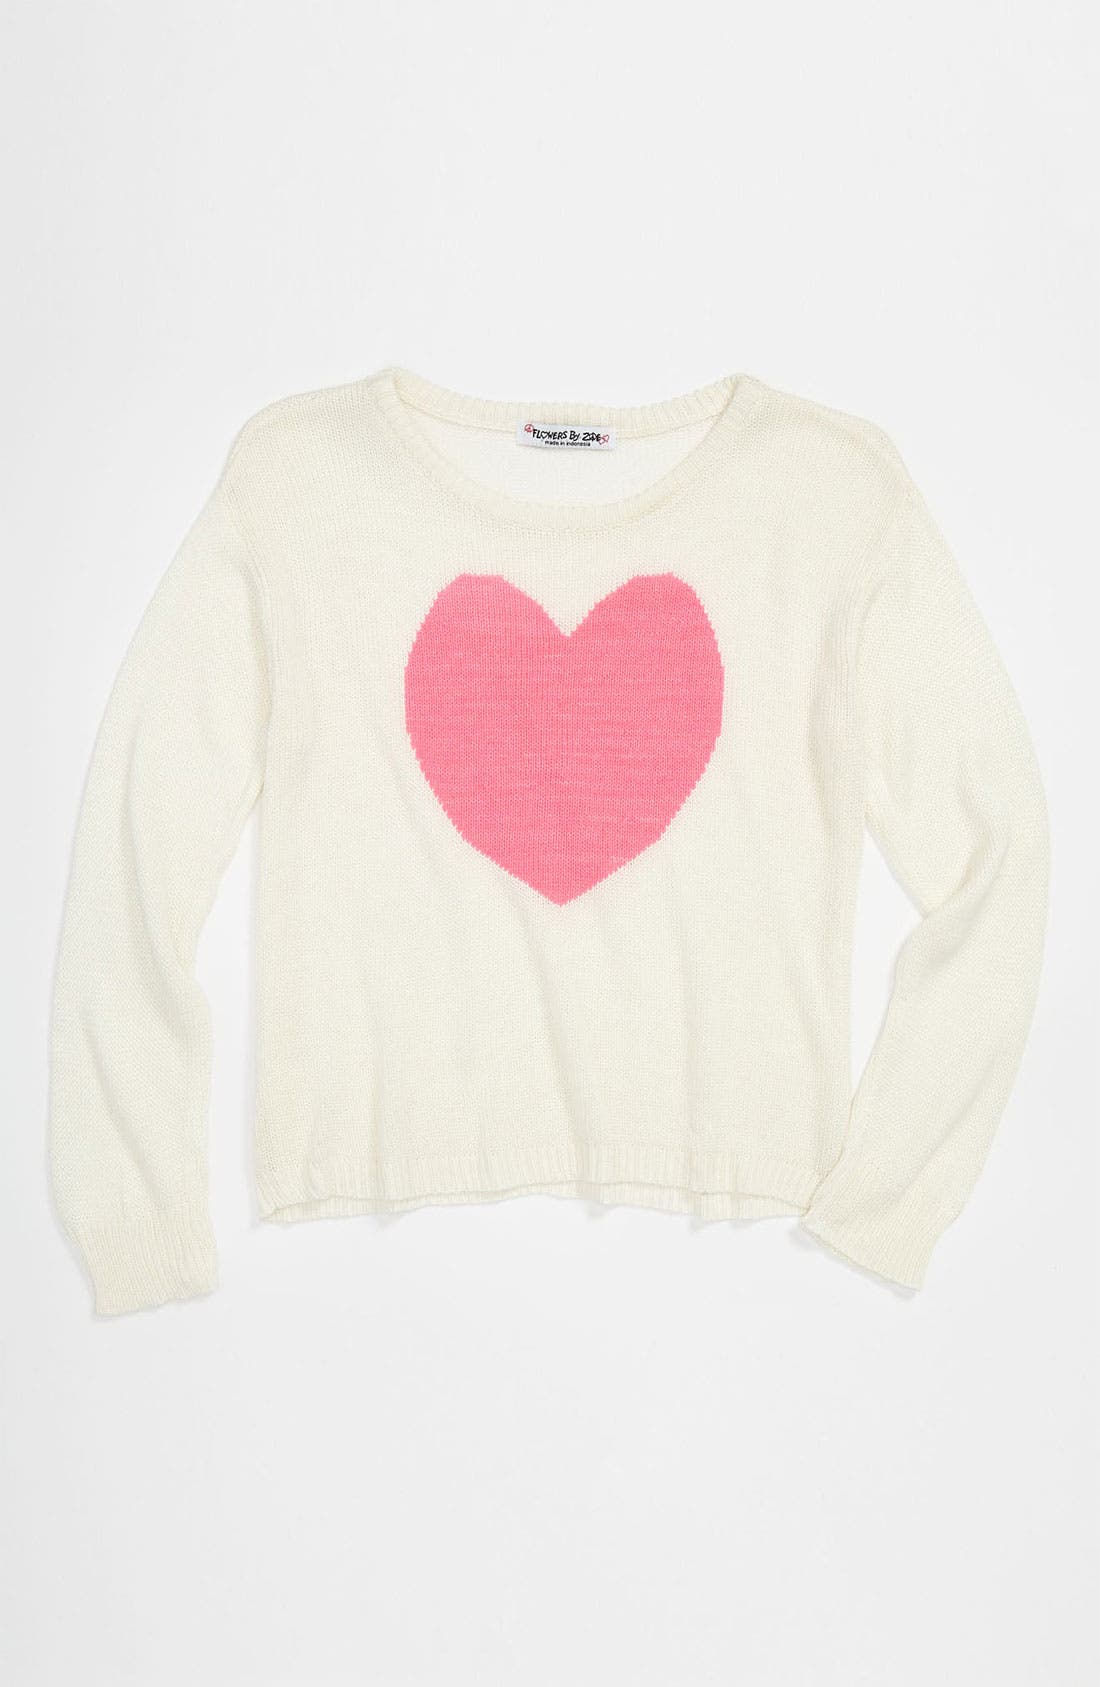 Main Image - Flowers by Zoe 'Heart' Sweater (Big Girls)